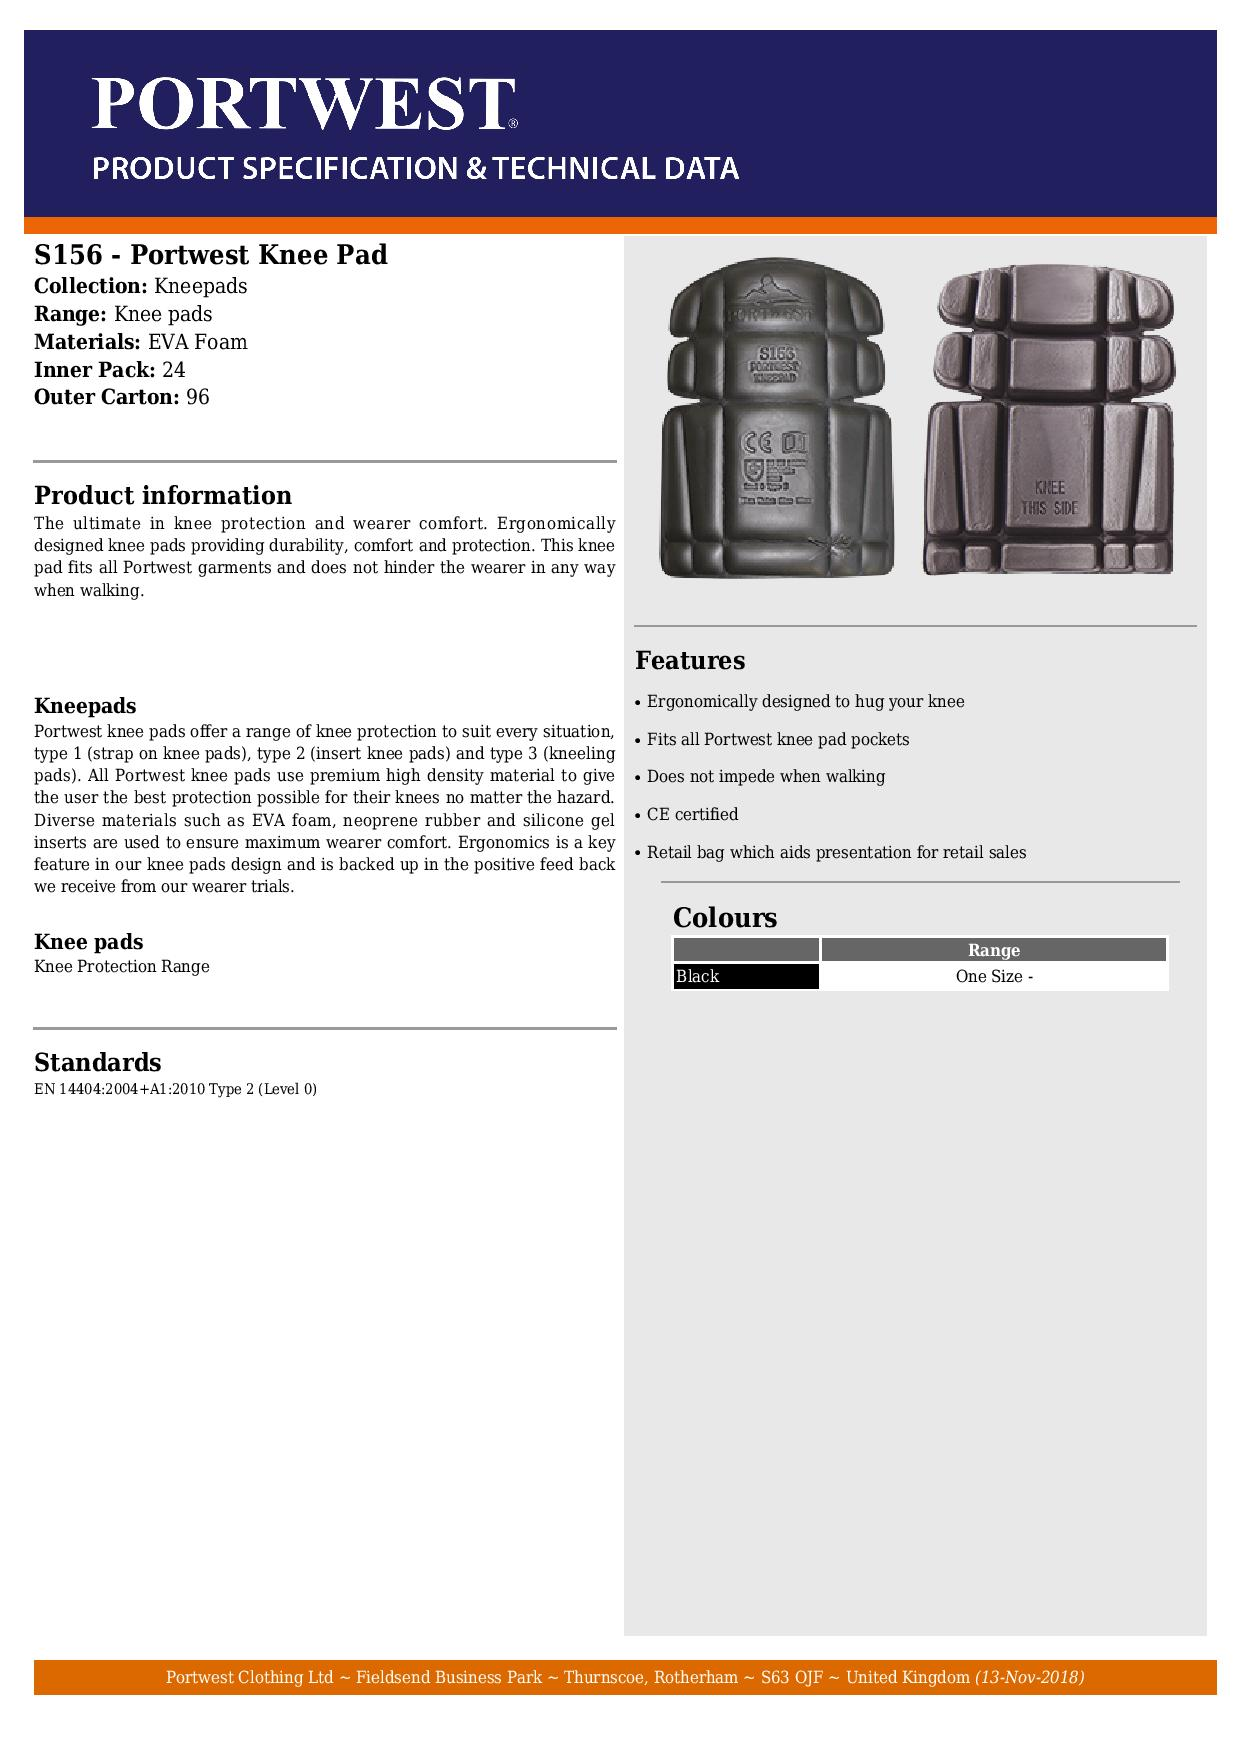 Portwest Black Knee Pad - Fits All Portwest Knee Pad Pockets